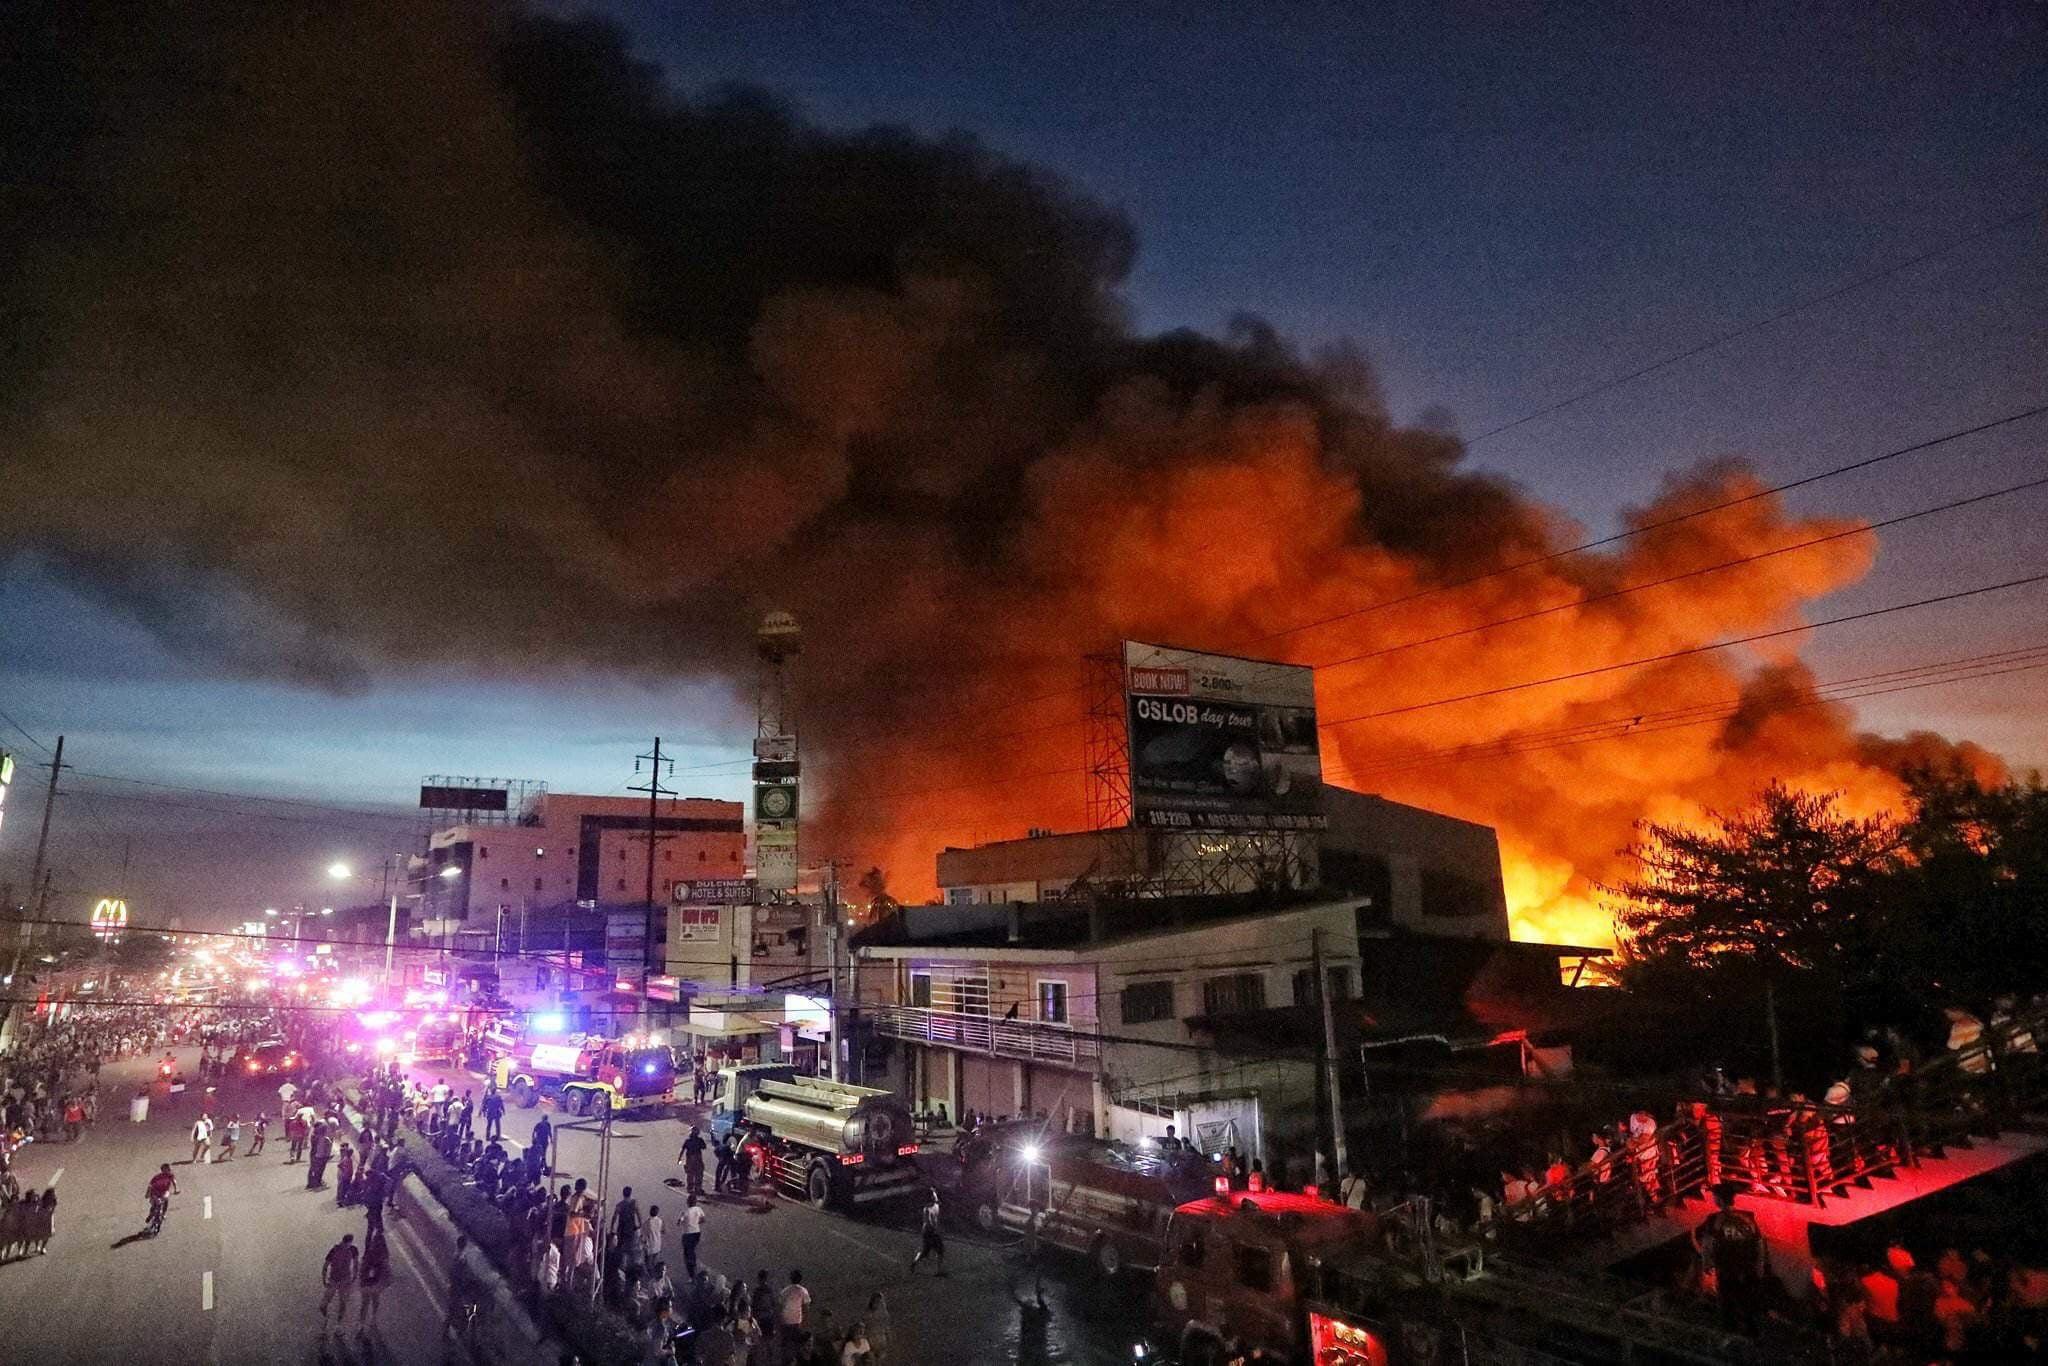 At least 300 houses razed in Lapu-Lapu City, Cebu fire-Philippines